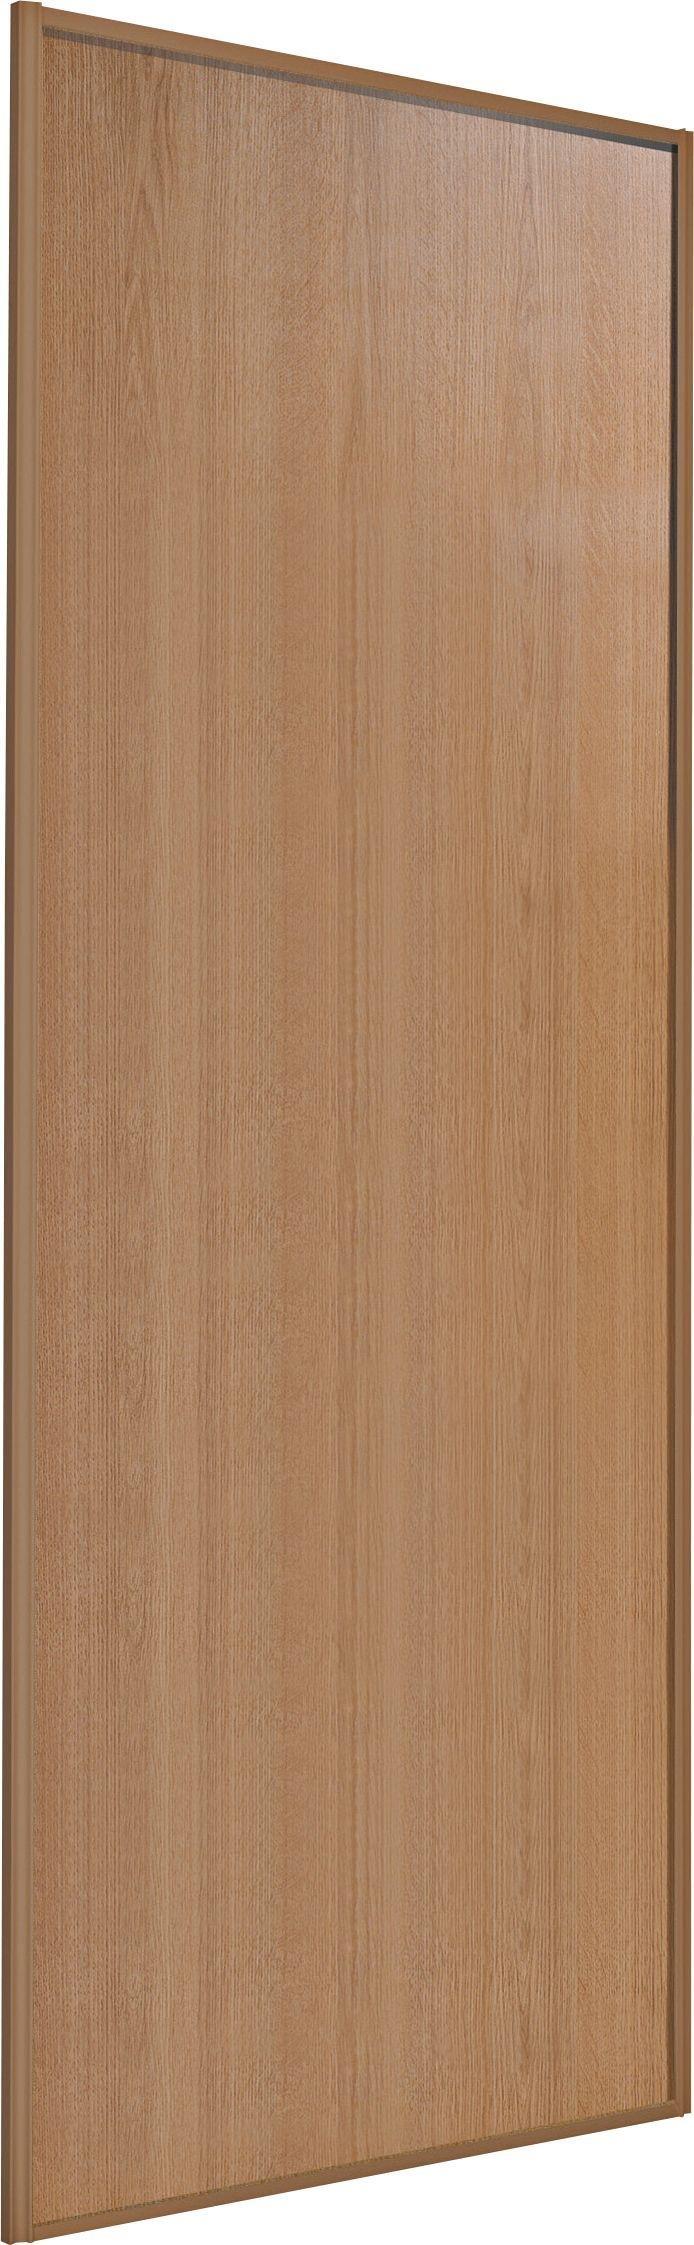 Sliding Wardrobe Door W61mm Oak Panel